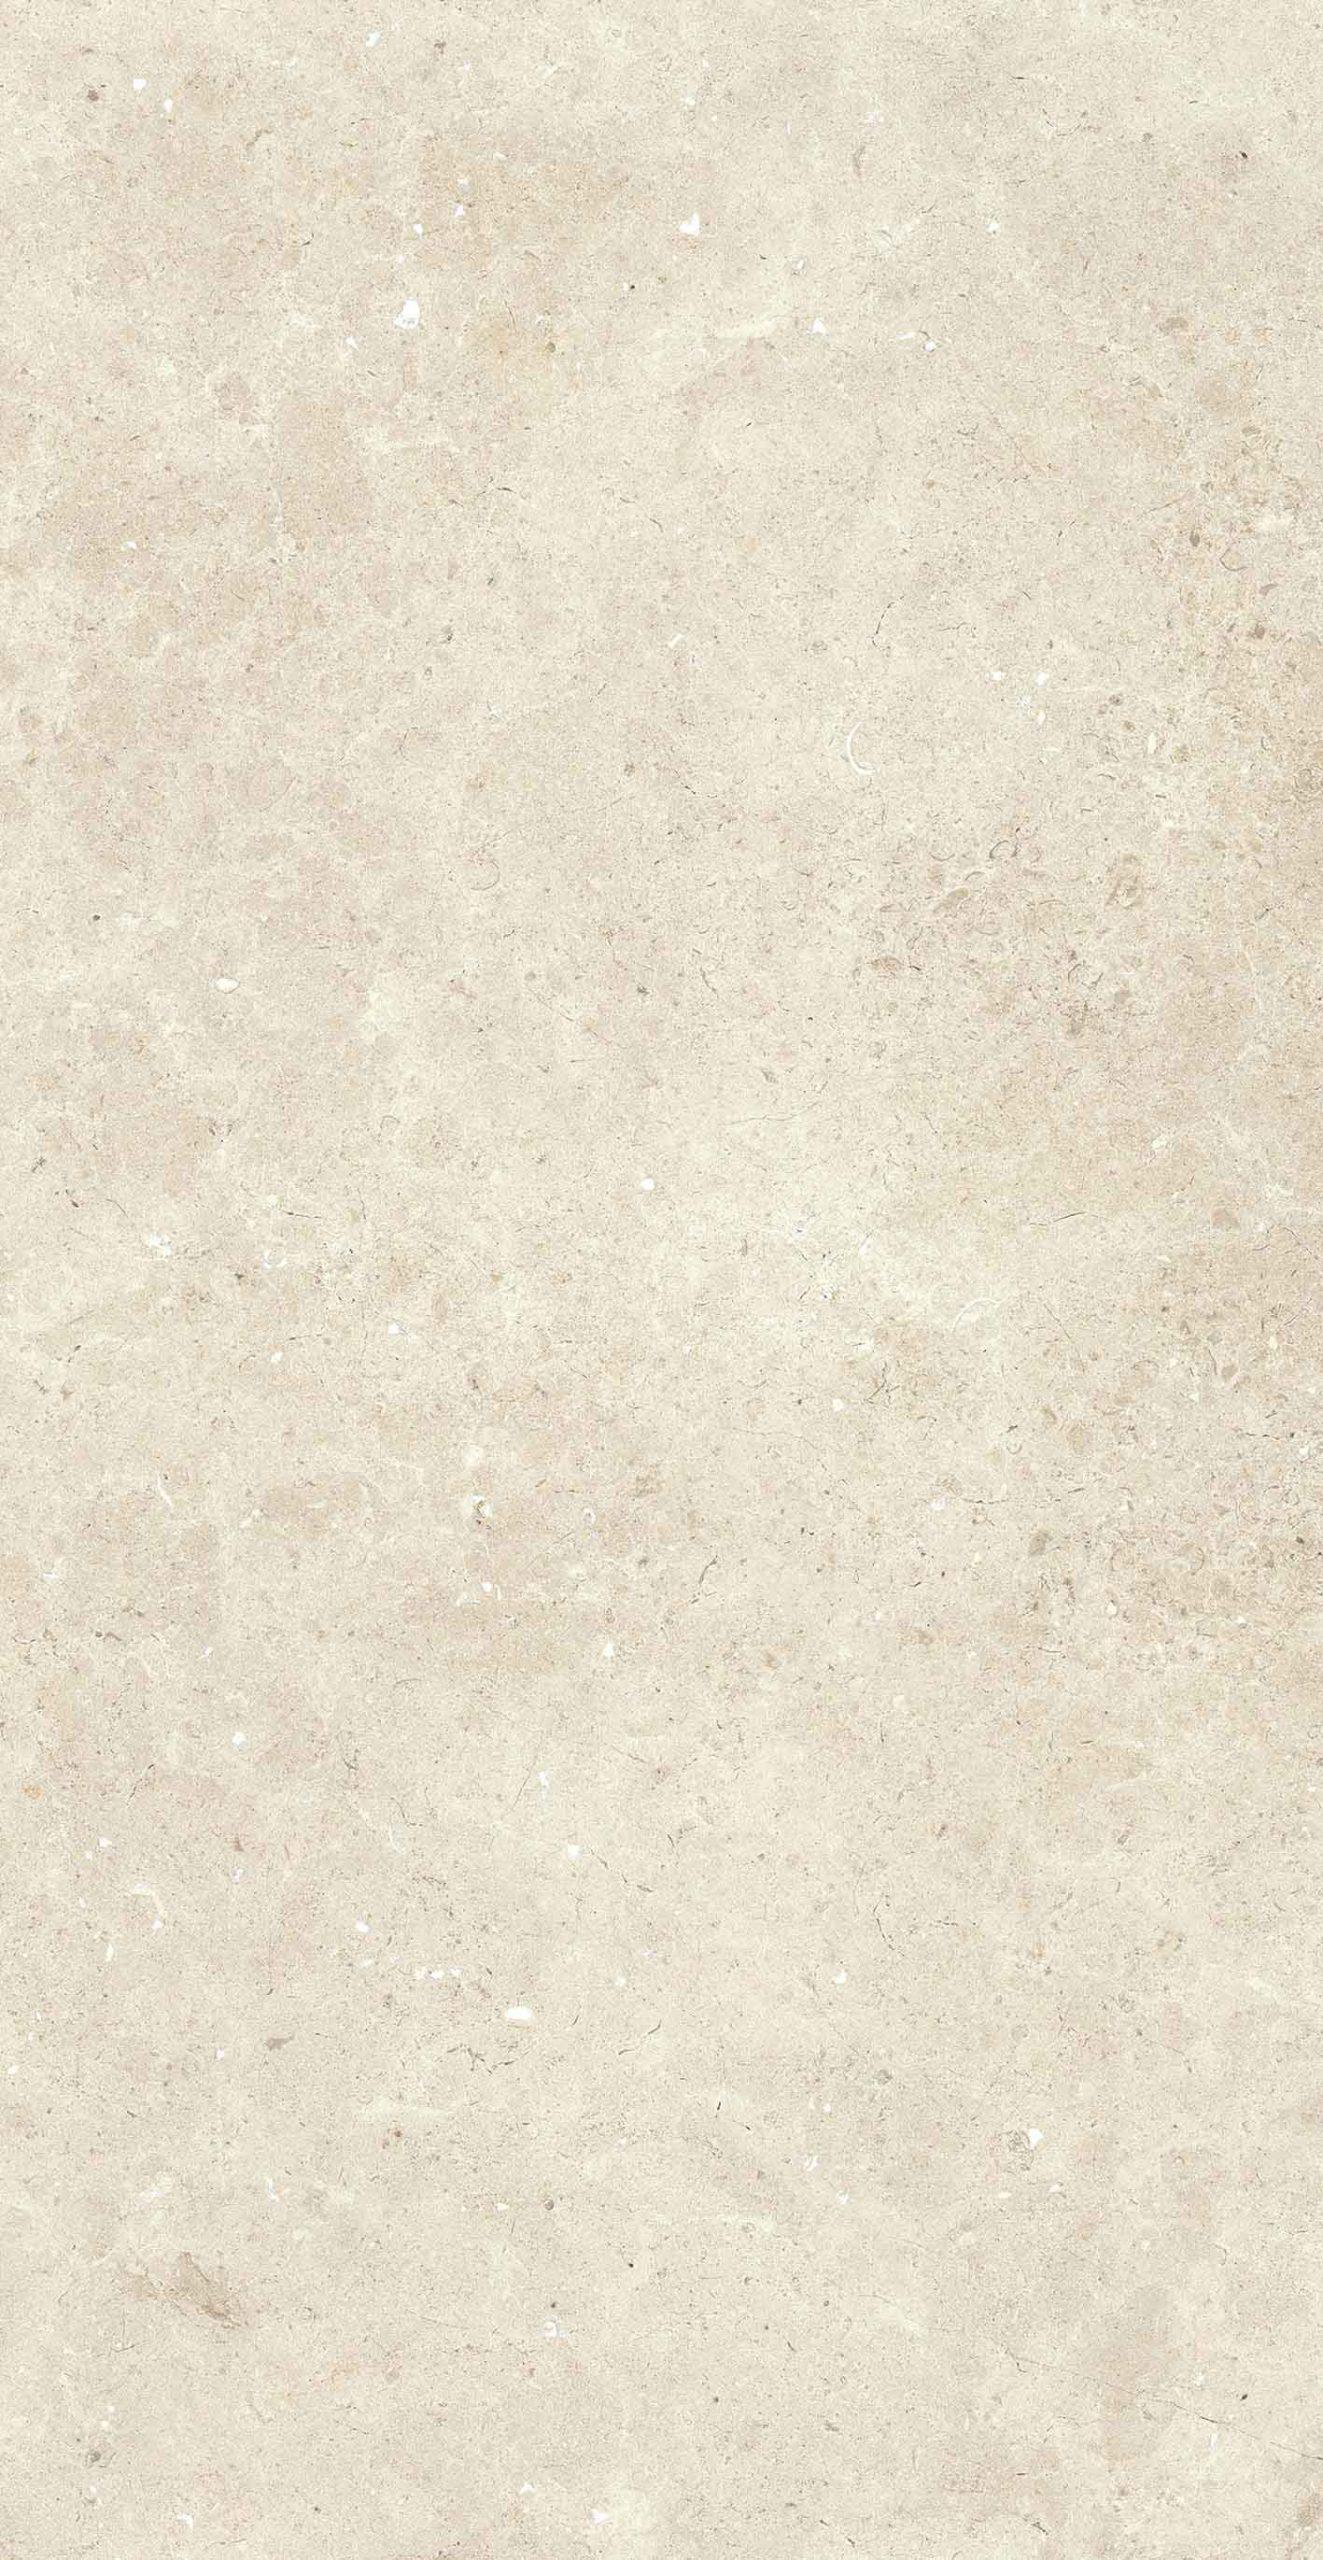 Stontech 4.0 Stone 02 Matte 10mm 40 x 80